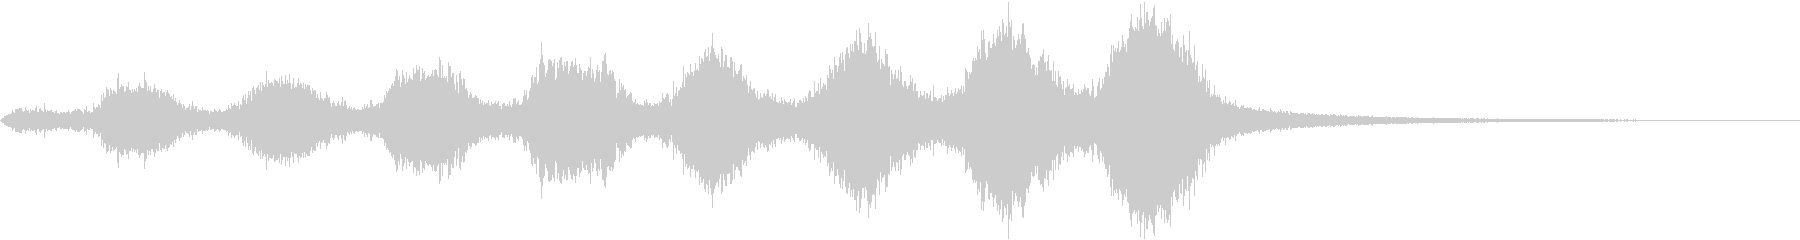 CINEMATIC RISER_33の未再生の波形